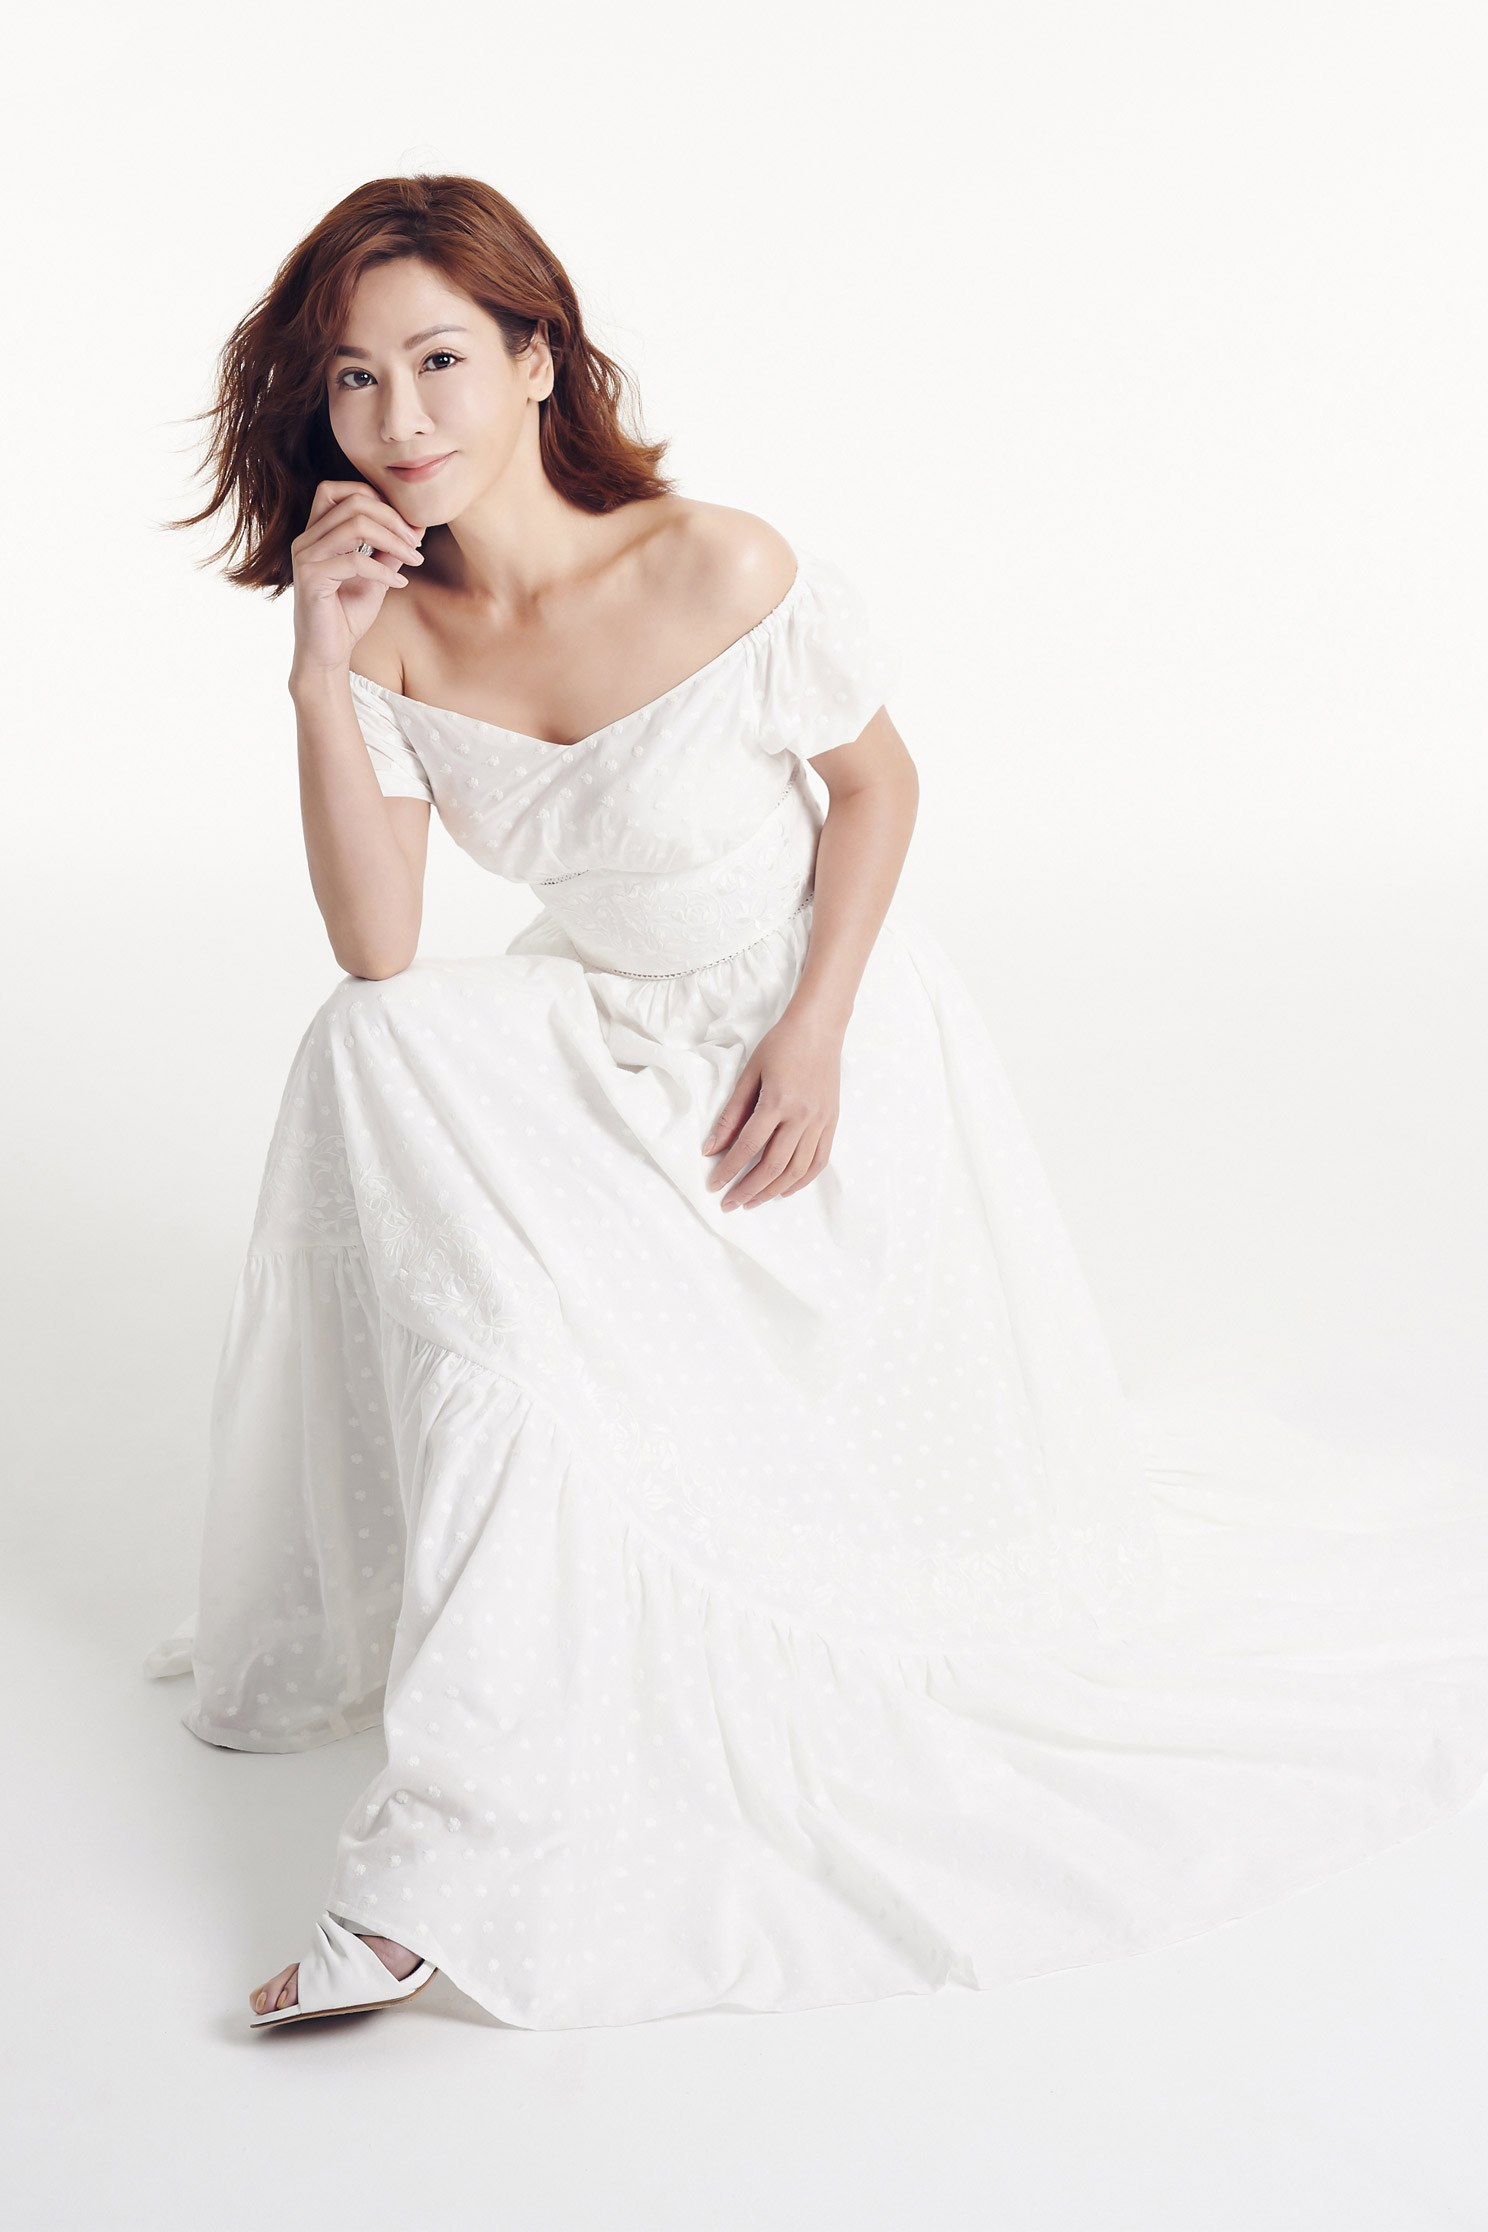 JACQUARD ruffle DRESS,dress,onlinelimitededition,longdress